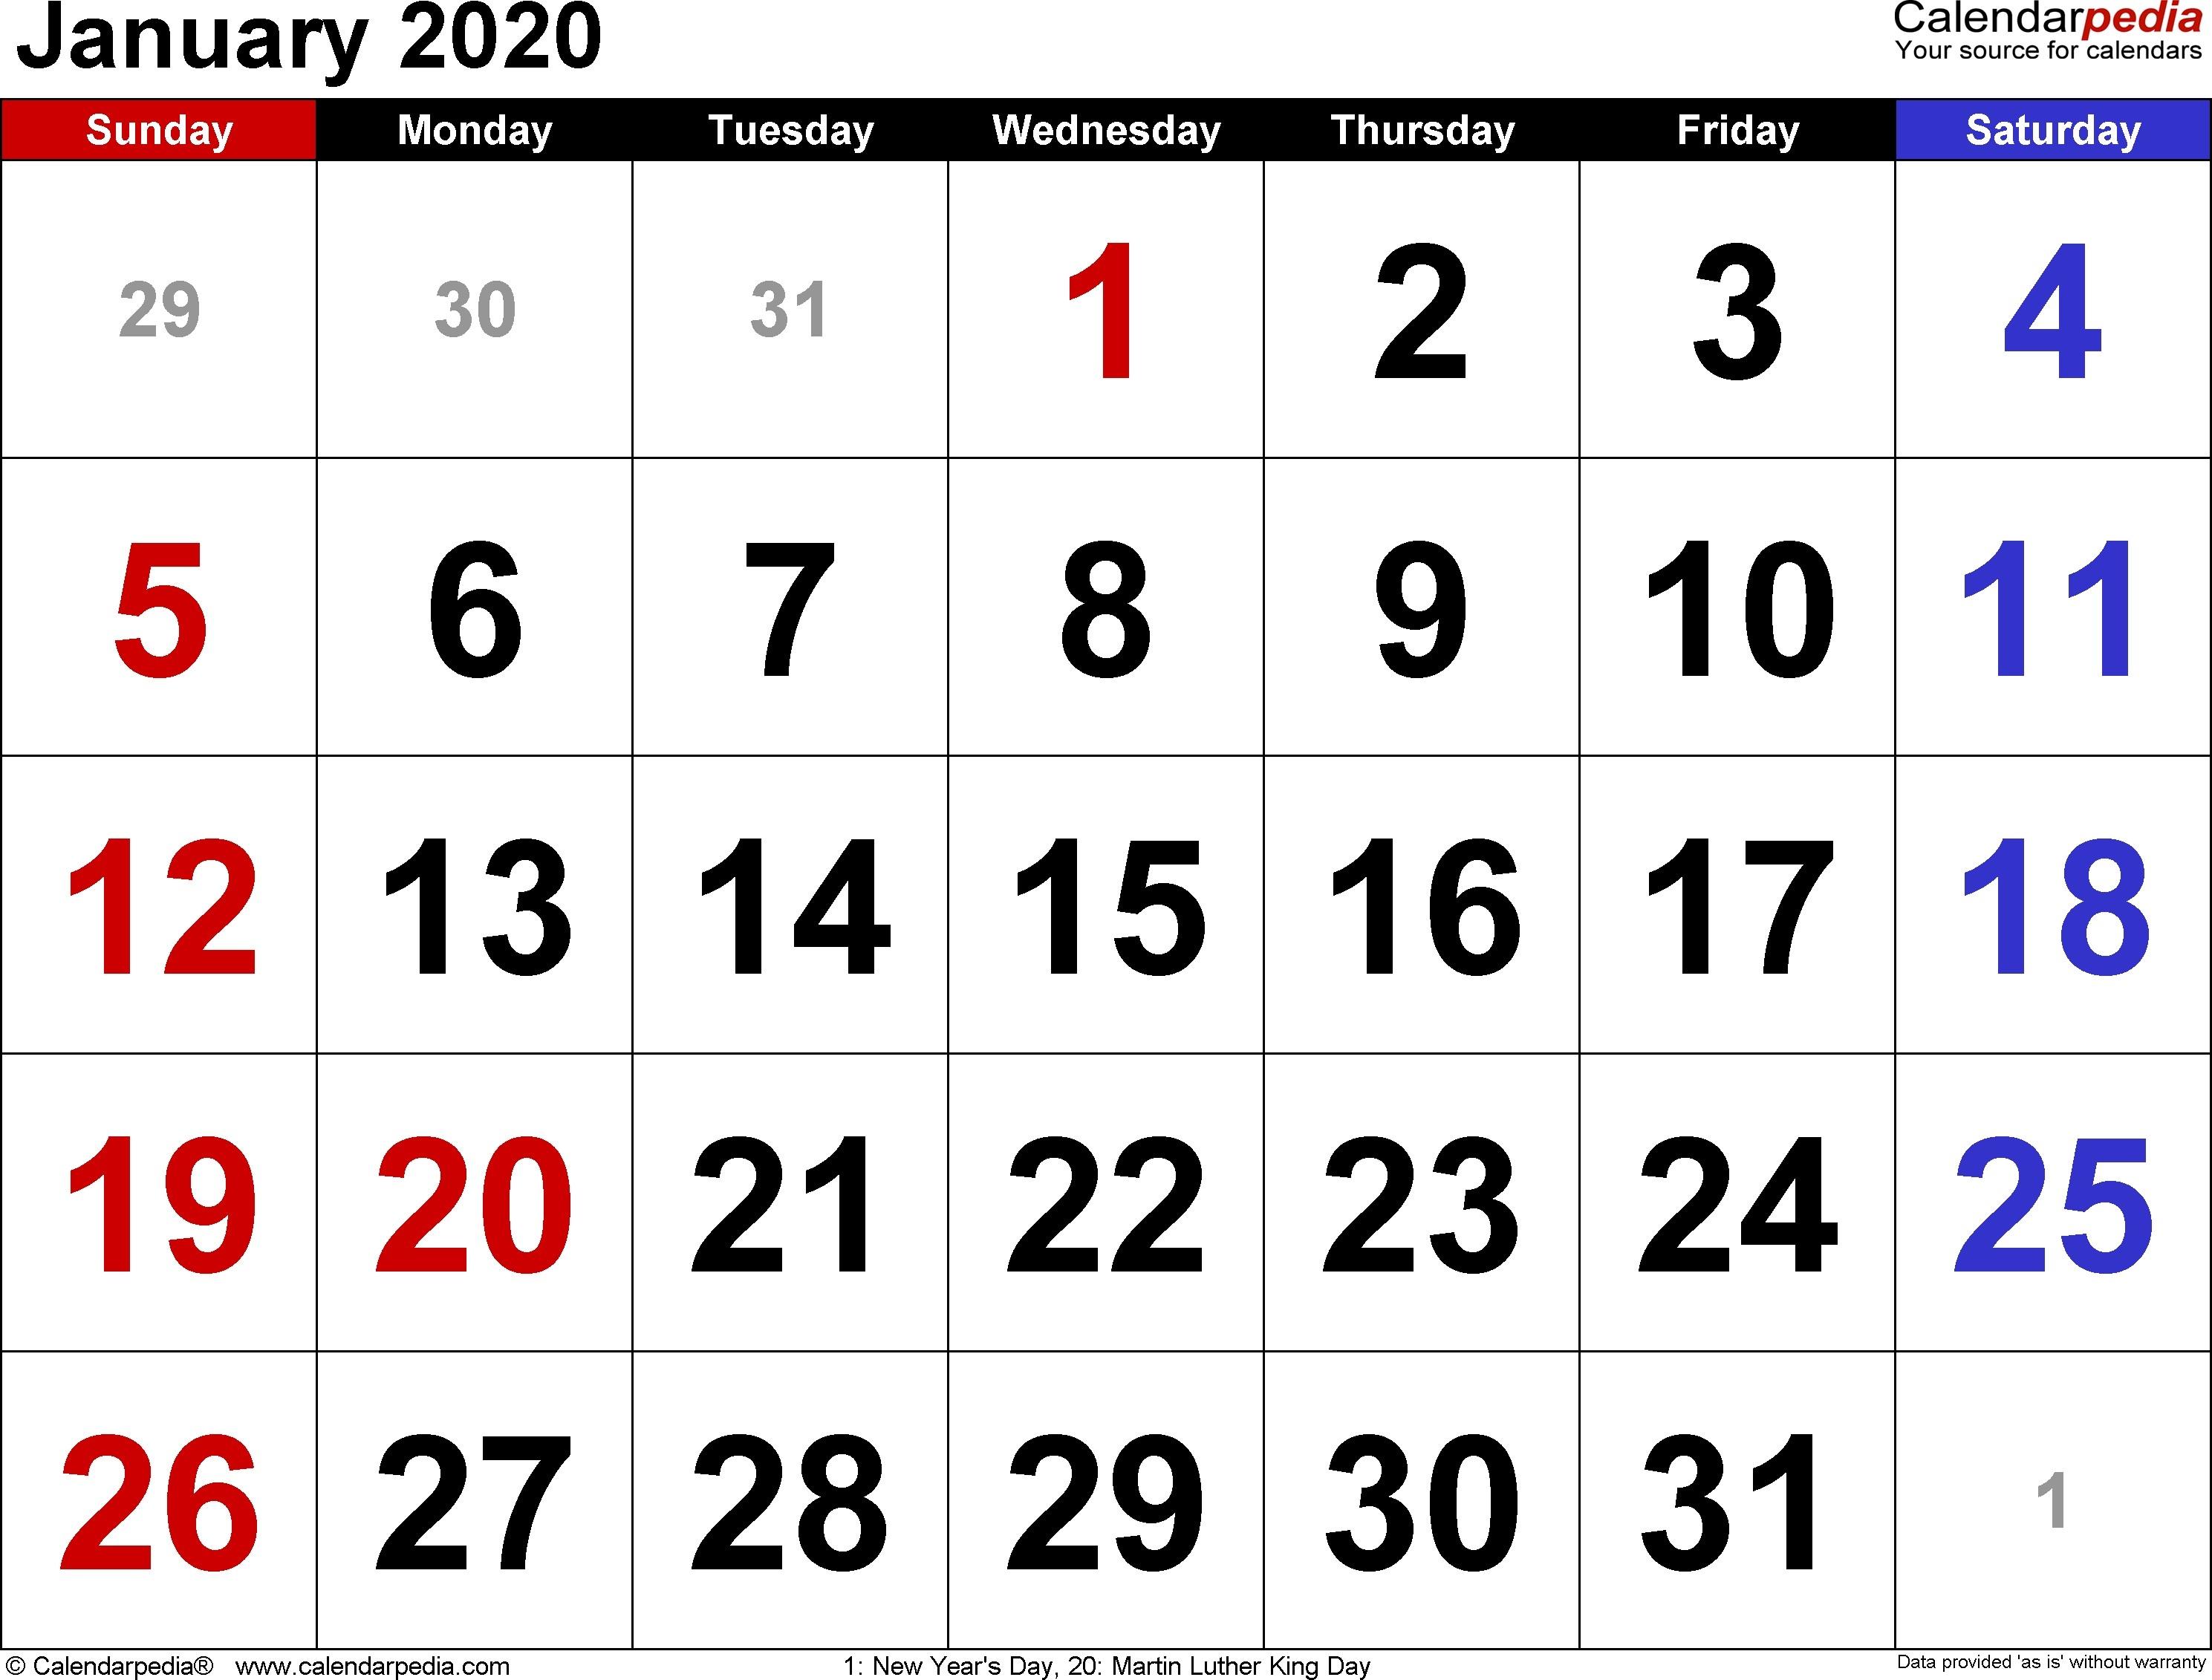 January 2020 Calendar 10 Calendar 2020 January - Calendar-January 2020 Calendar Hindu